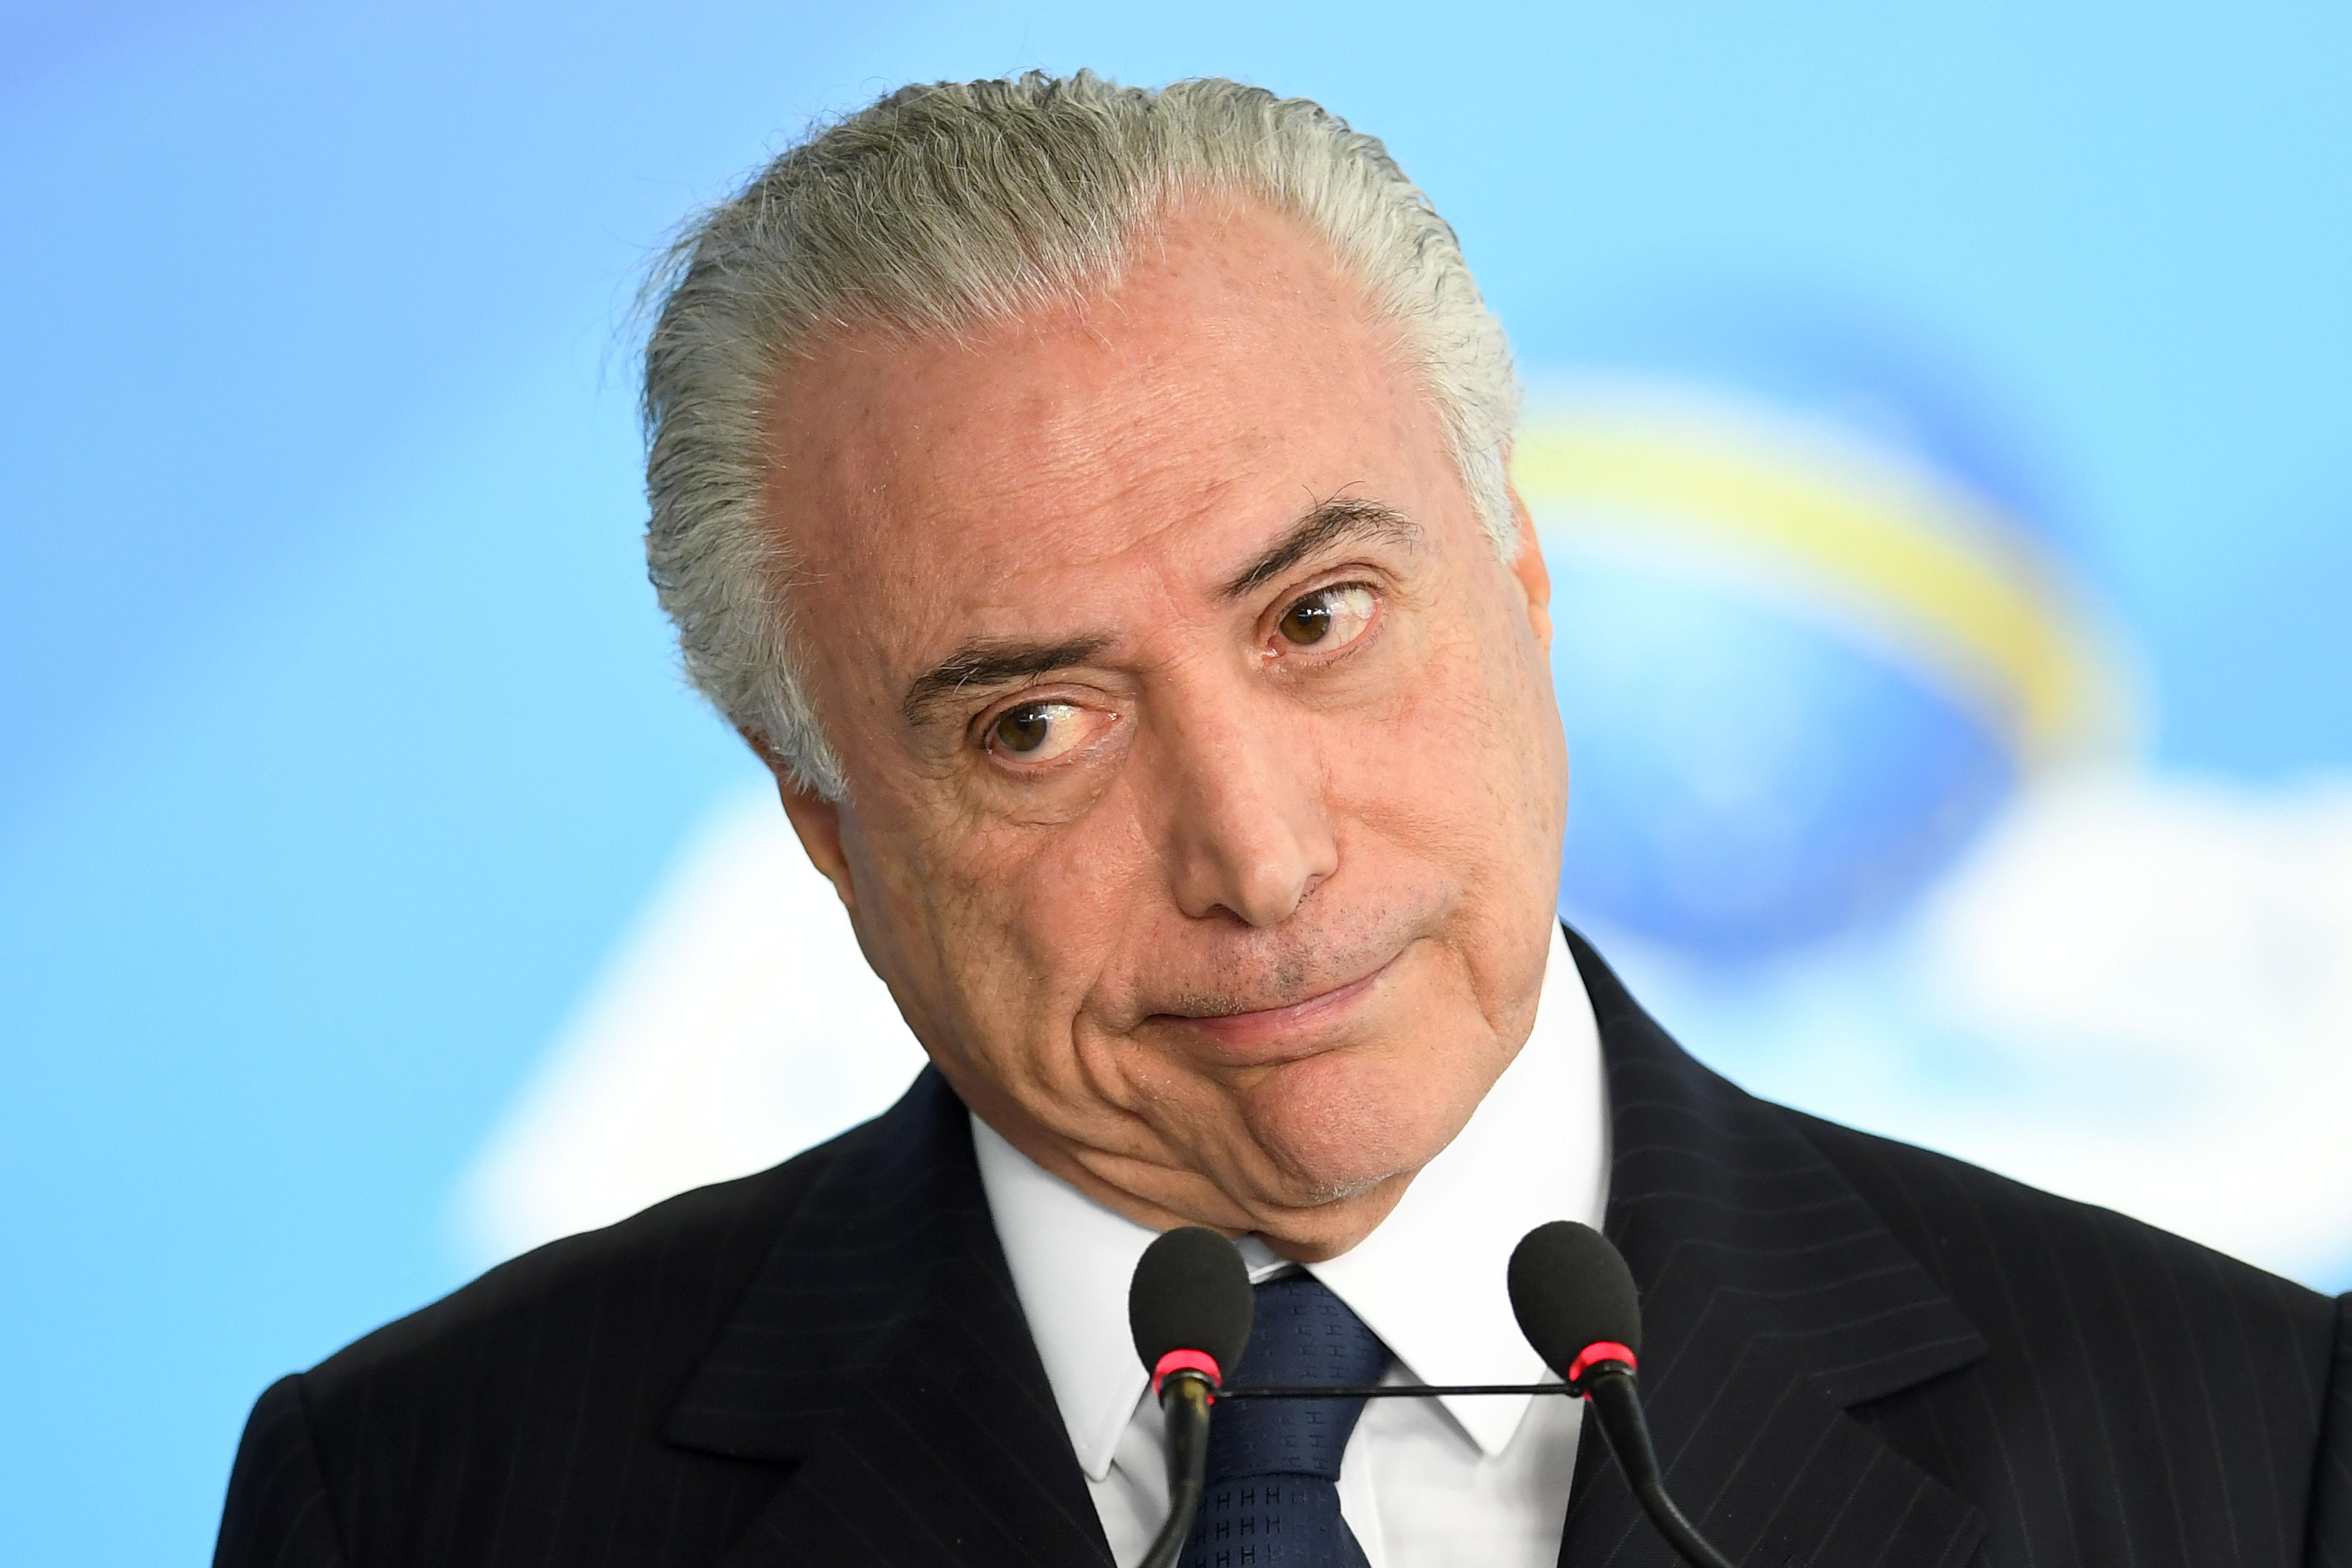 BRAZIL-CORRUPTION-TEMER